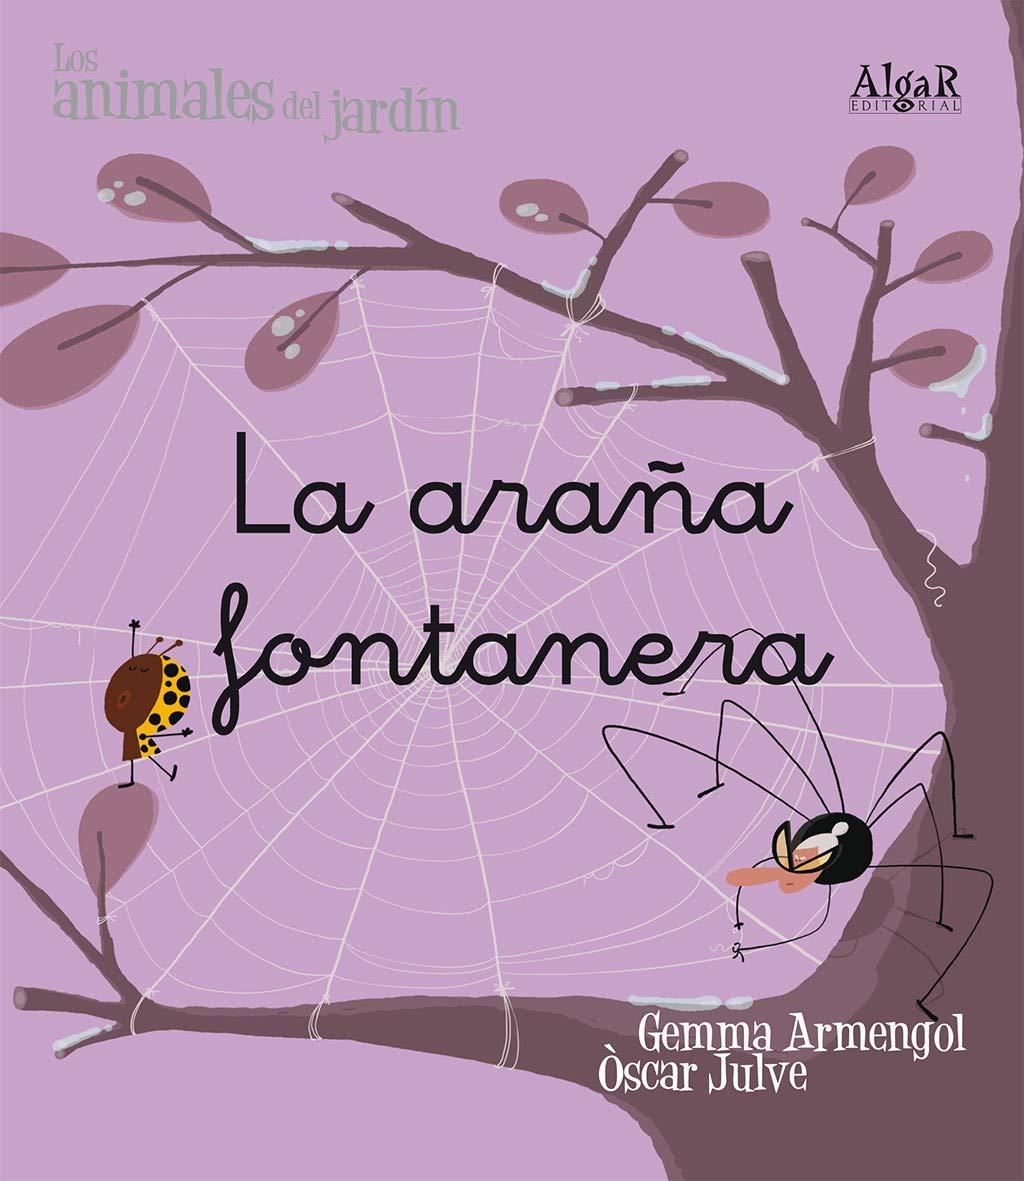 La araña fontanera: 2 (Los animales del jardín): Amazon.es: Armengol Morell, Gemma, Julve Gil, Òscar, Martí Sanjuan, Pau: Libros